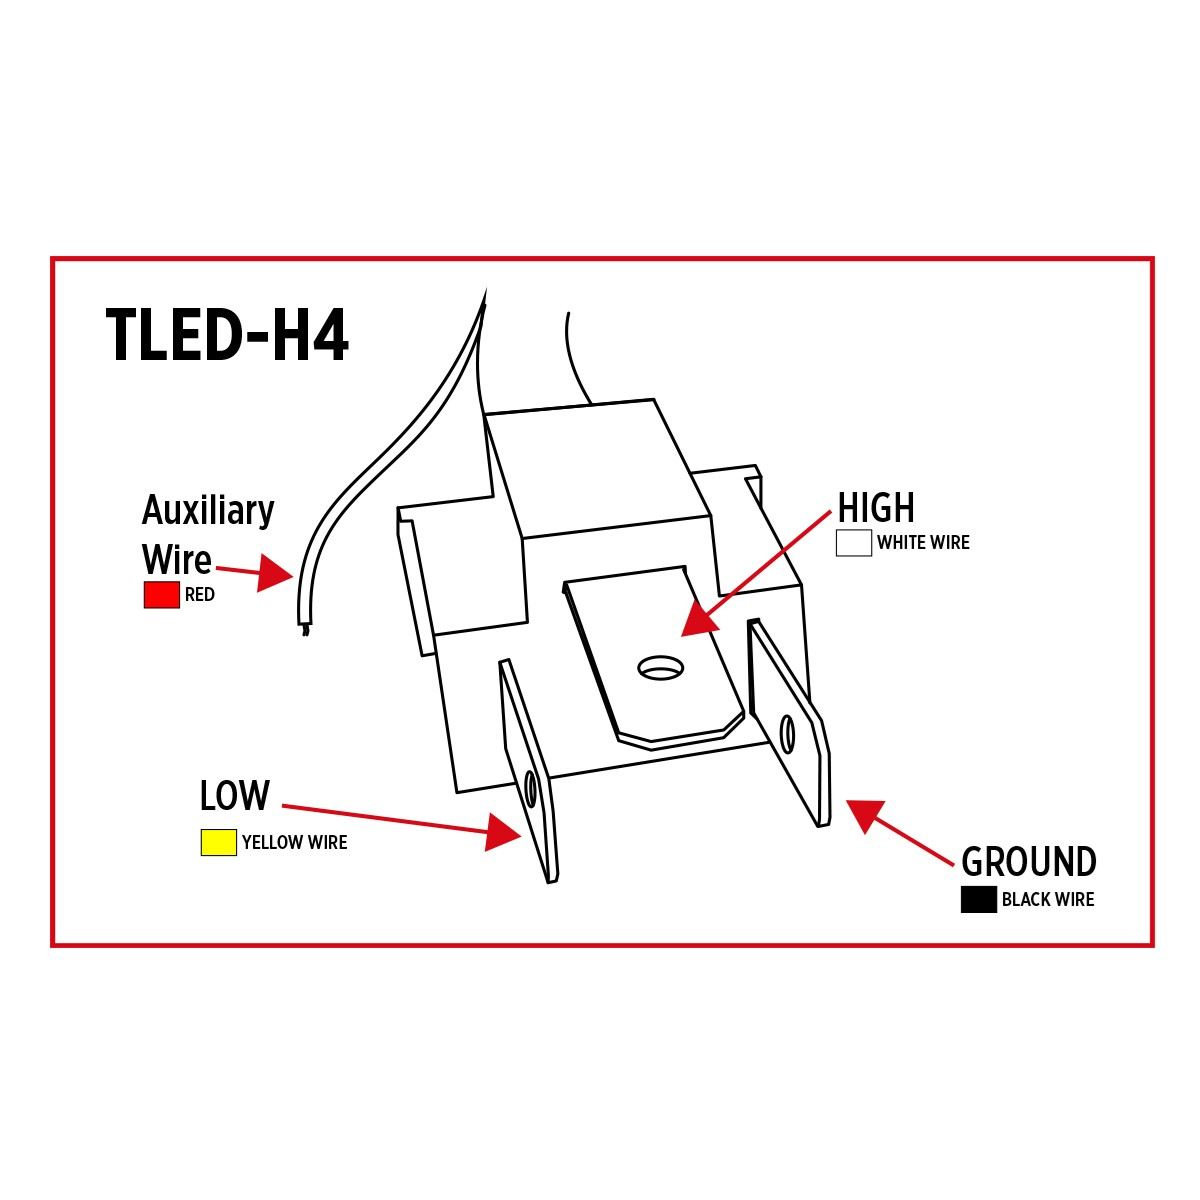 hight resolution of h4651 headlight socket wiring diagram manual e books headlight socket wiring diagram